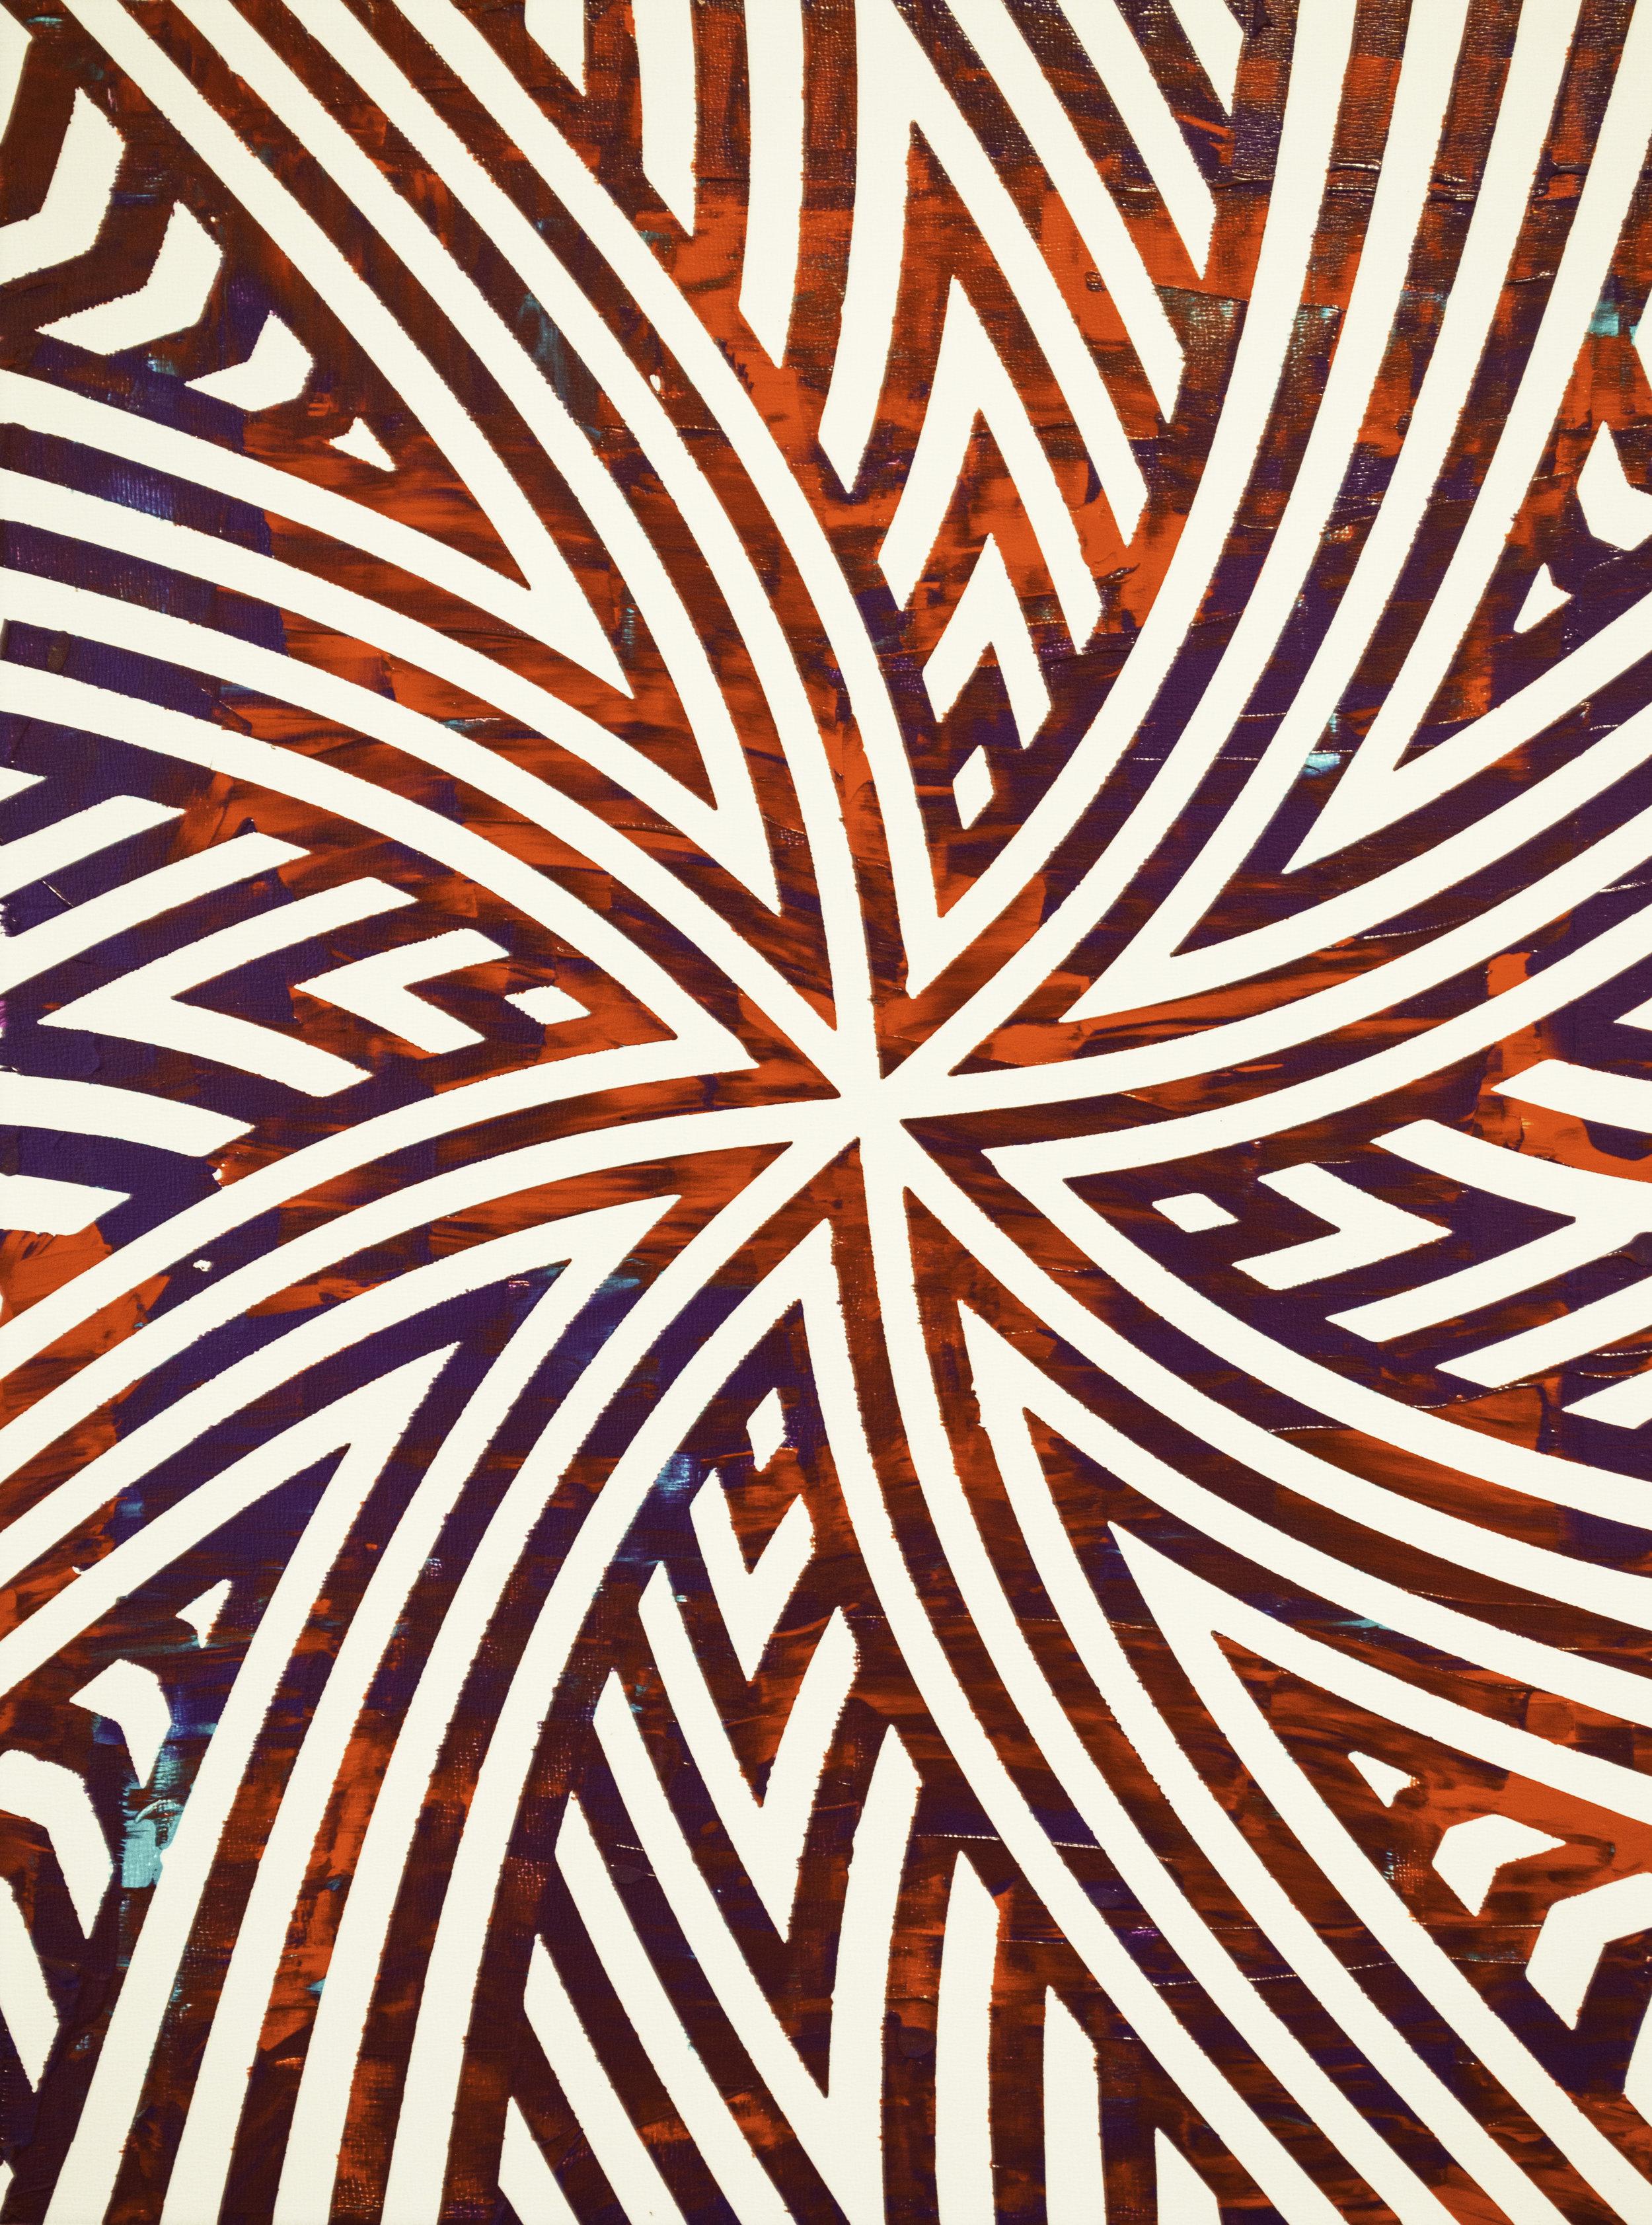 HUE Gallery of Contemporary Art - Sean Christopher Ward - Spinning - Acrylic on MDF - 12x16 - 2019 - $375.jpg